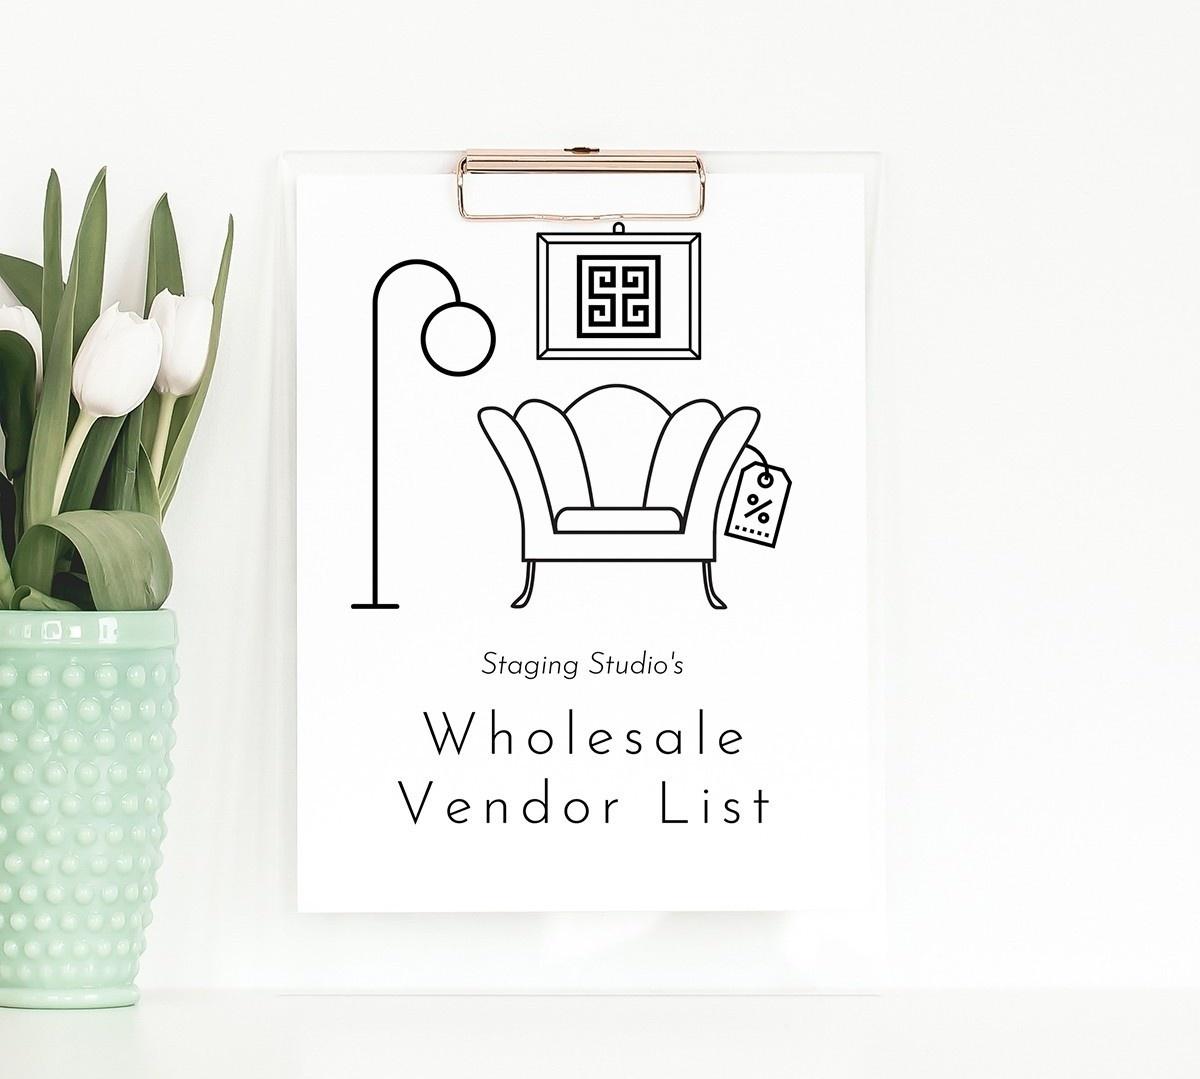 Staging Studio Wholesale Vendor List on Clipboard